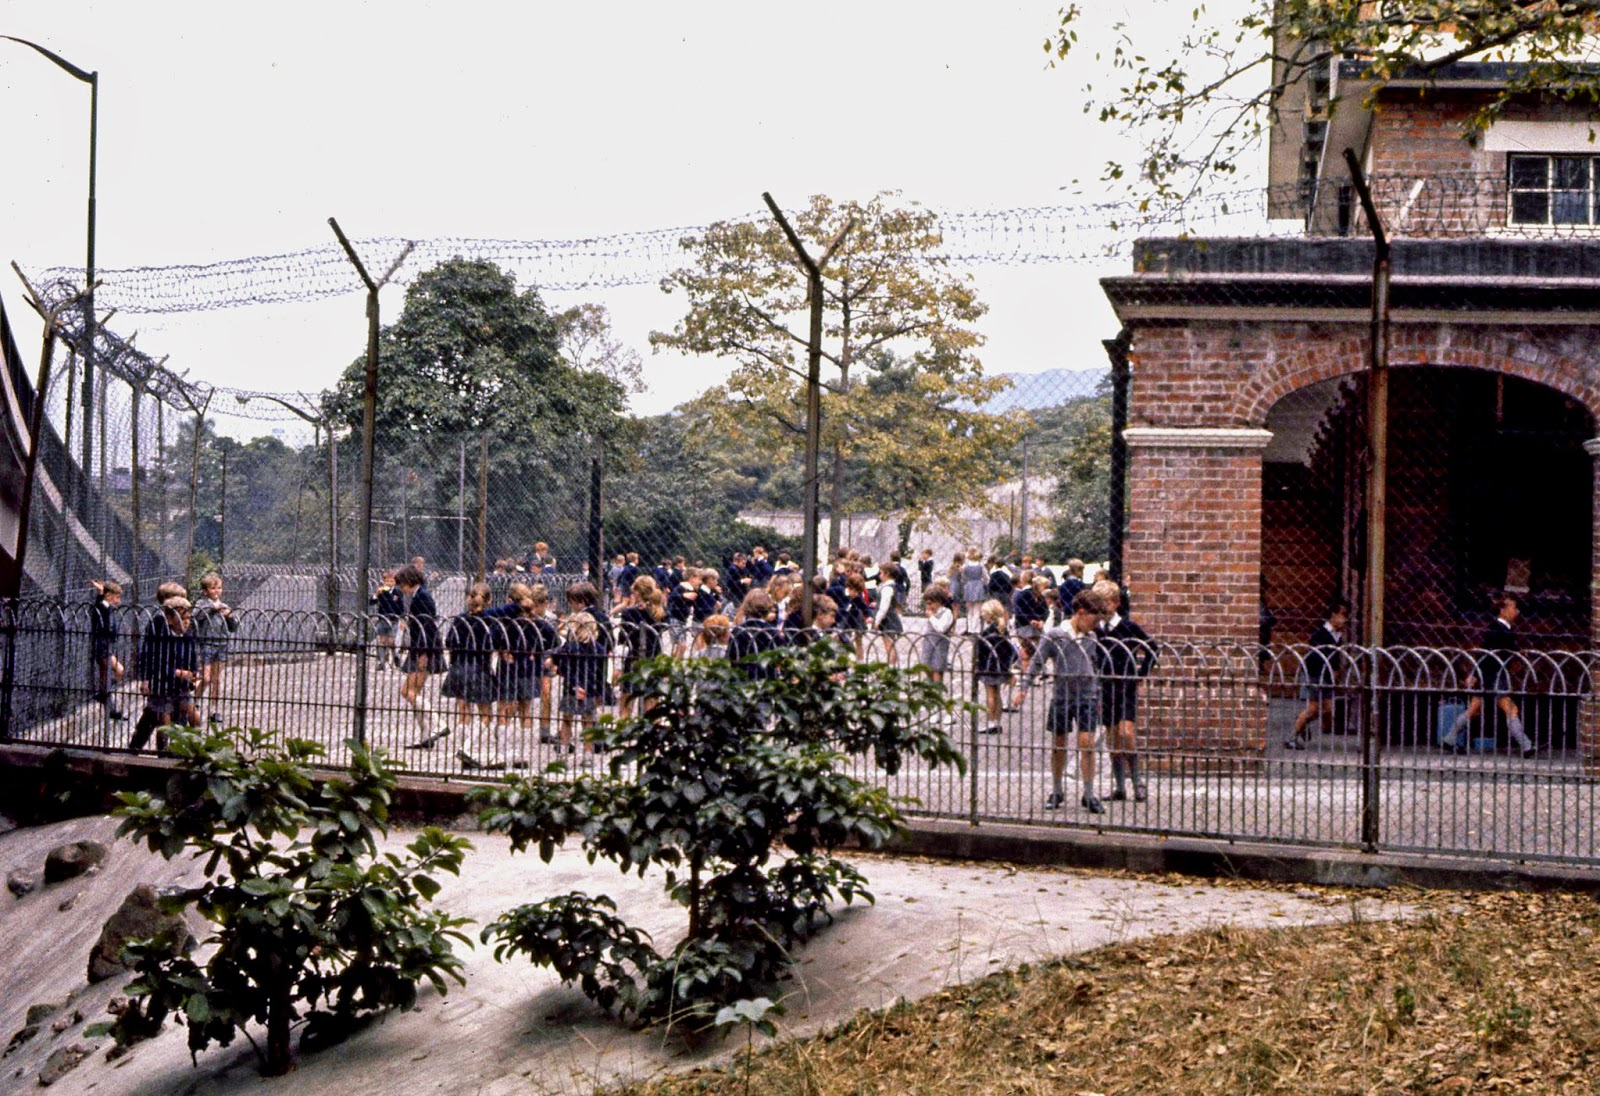 School children behind barbed wire - Hong Kong 1969